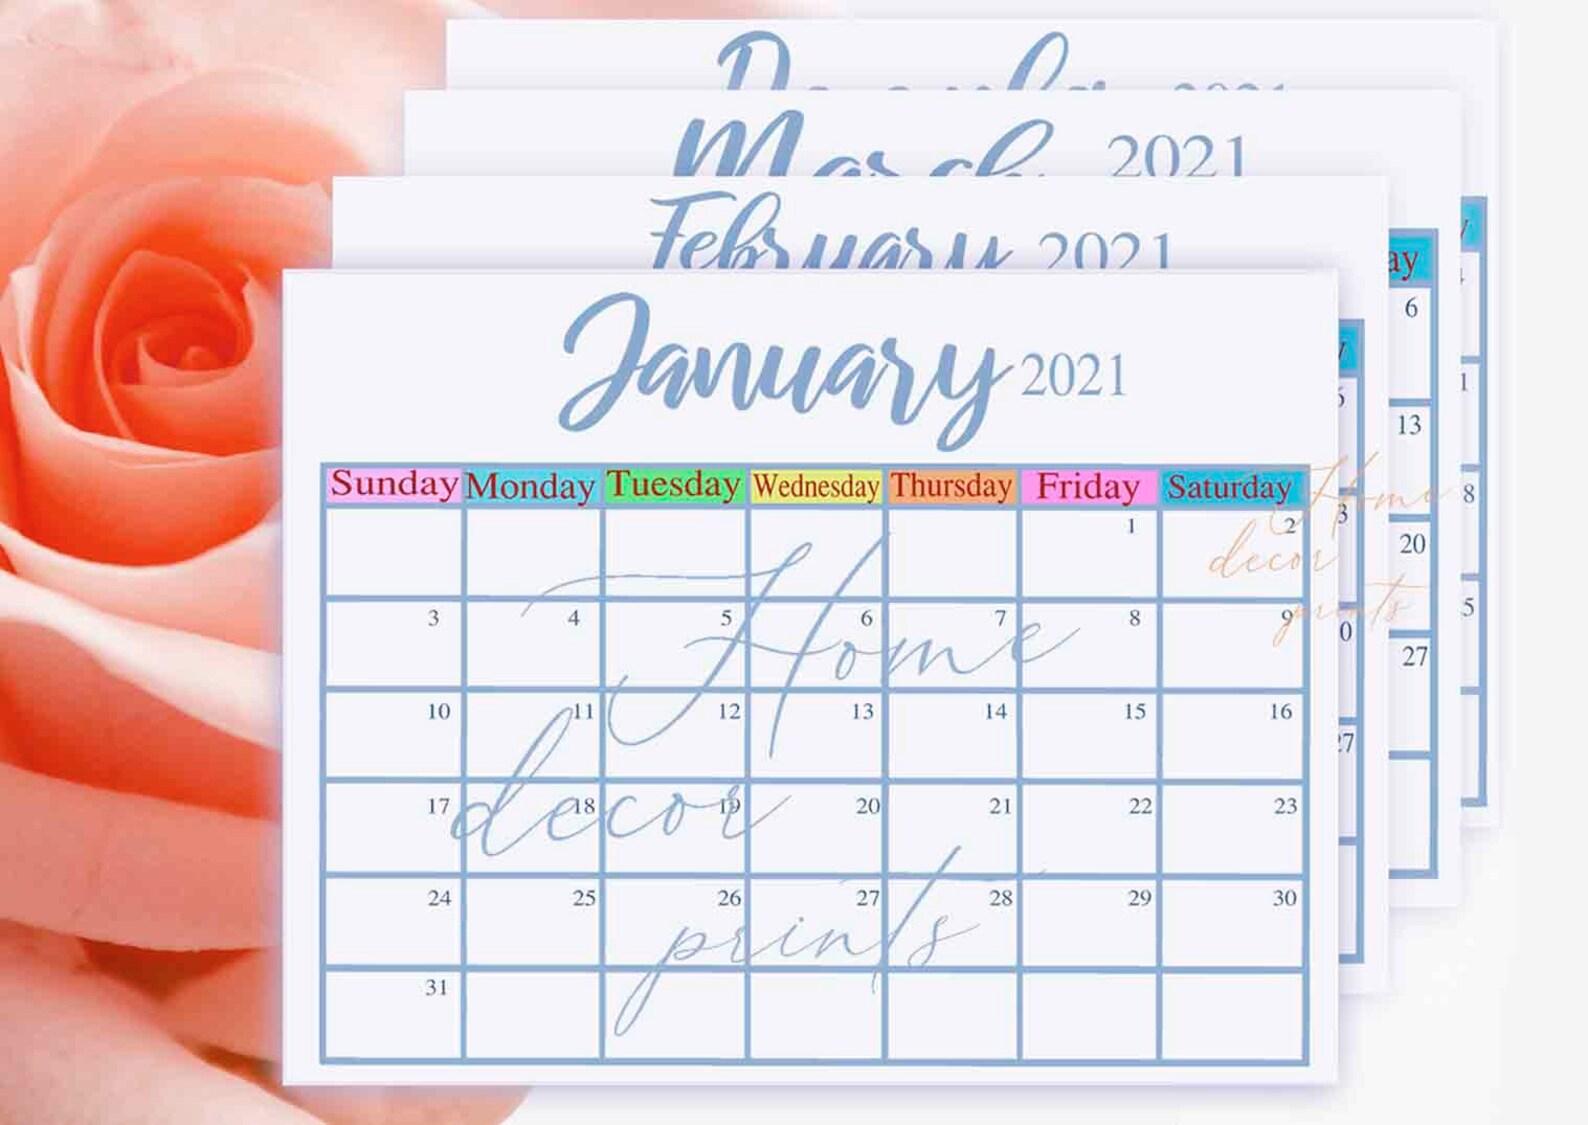 2021 Calendar 12 Months Calendar Printable March April May With Regard To 2021 Calendar March April May